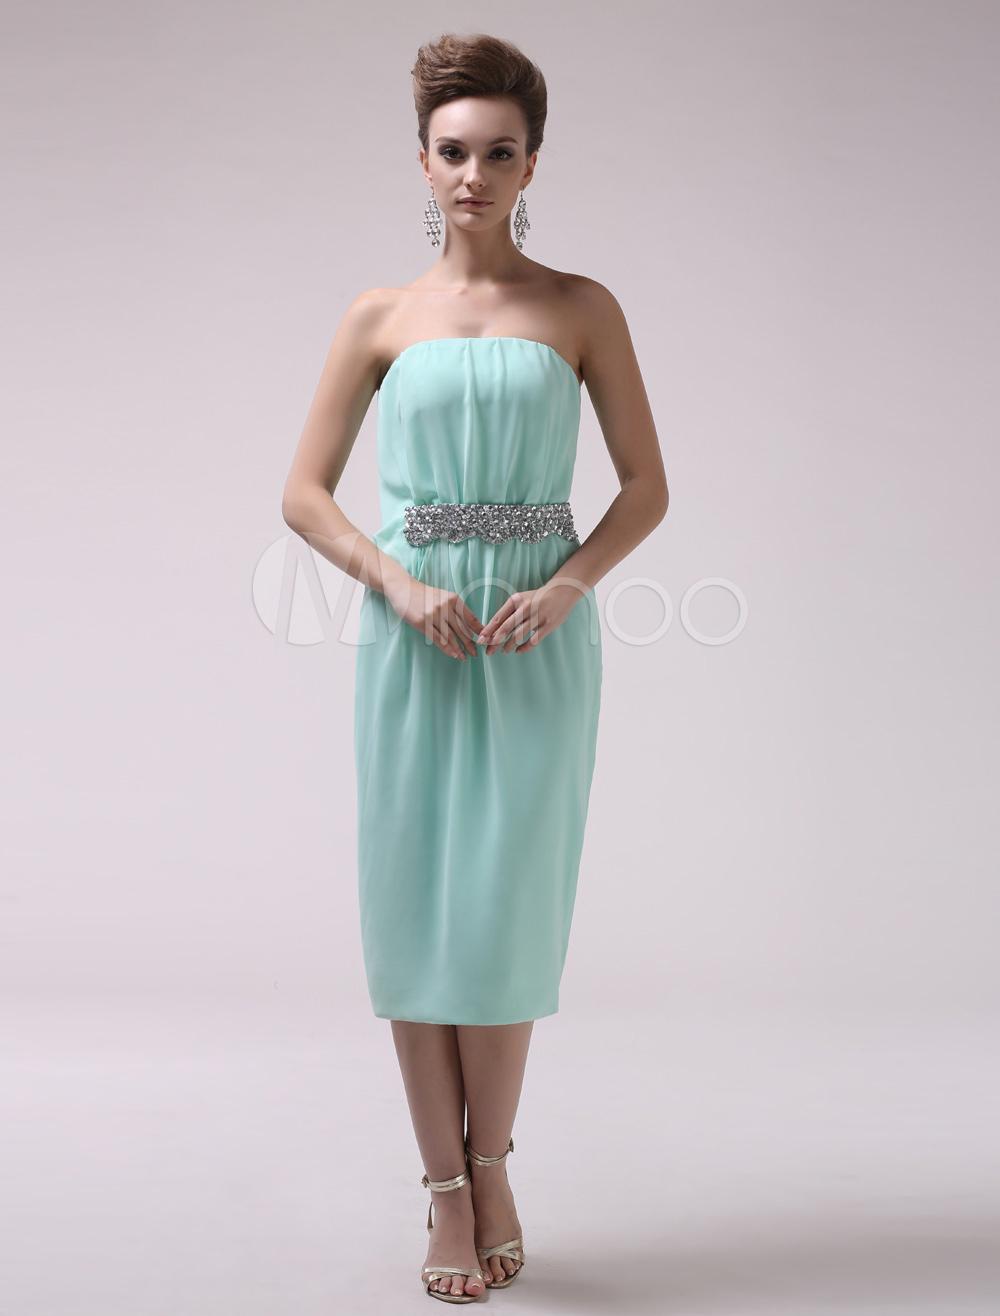 Mint Green Sheath Beading Strapless Chiffon Modern Cocktail Dress Milanoo (Wedding Cocktail Dresses) photo